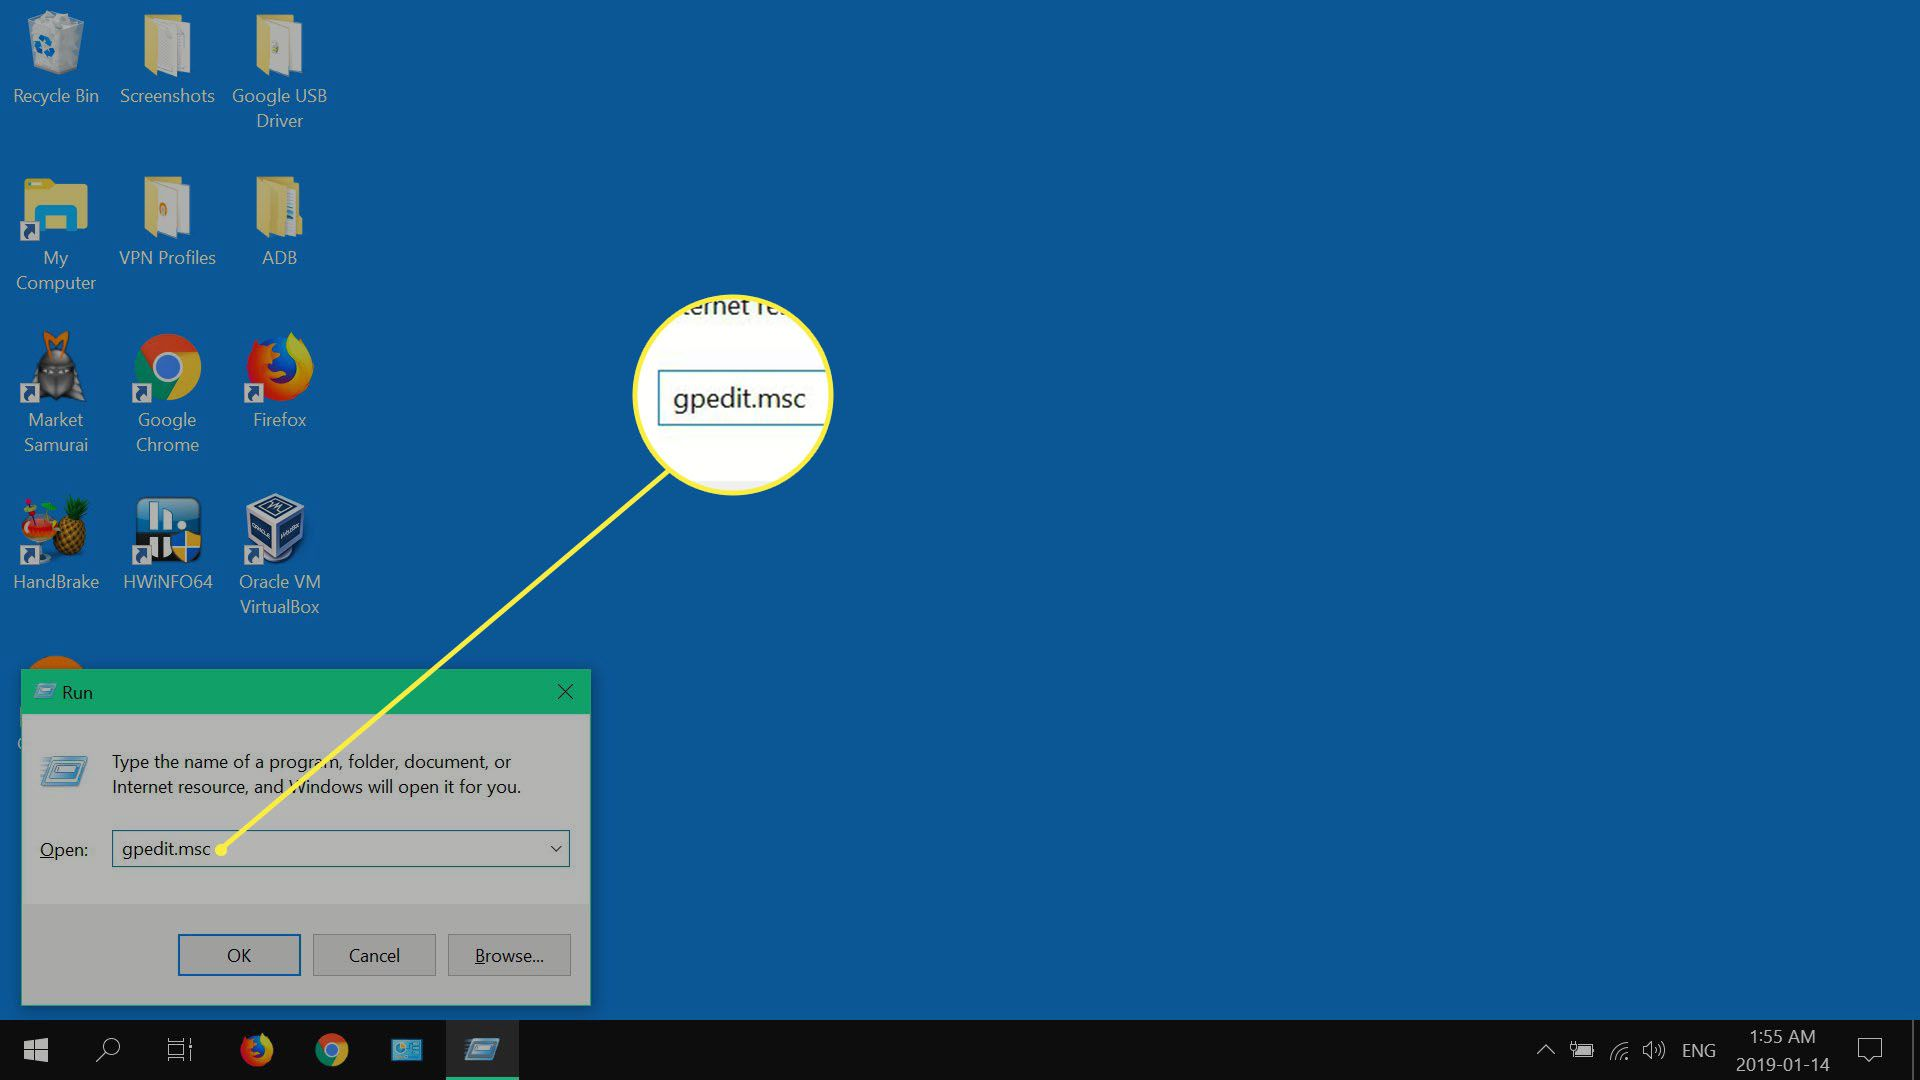 Windows 10 Run window.